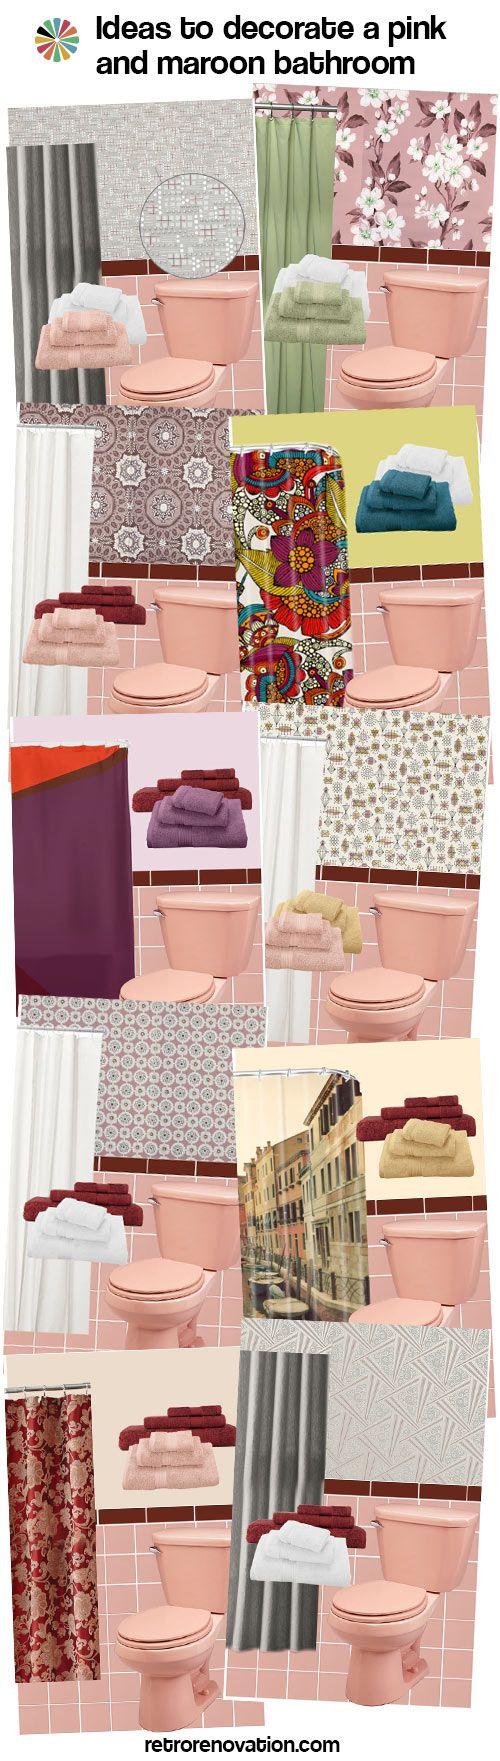 Retro pink bathroom ideas - 11 Ideas To Decorate A Burgundy And Pink Bathroom